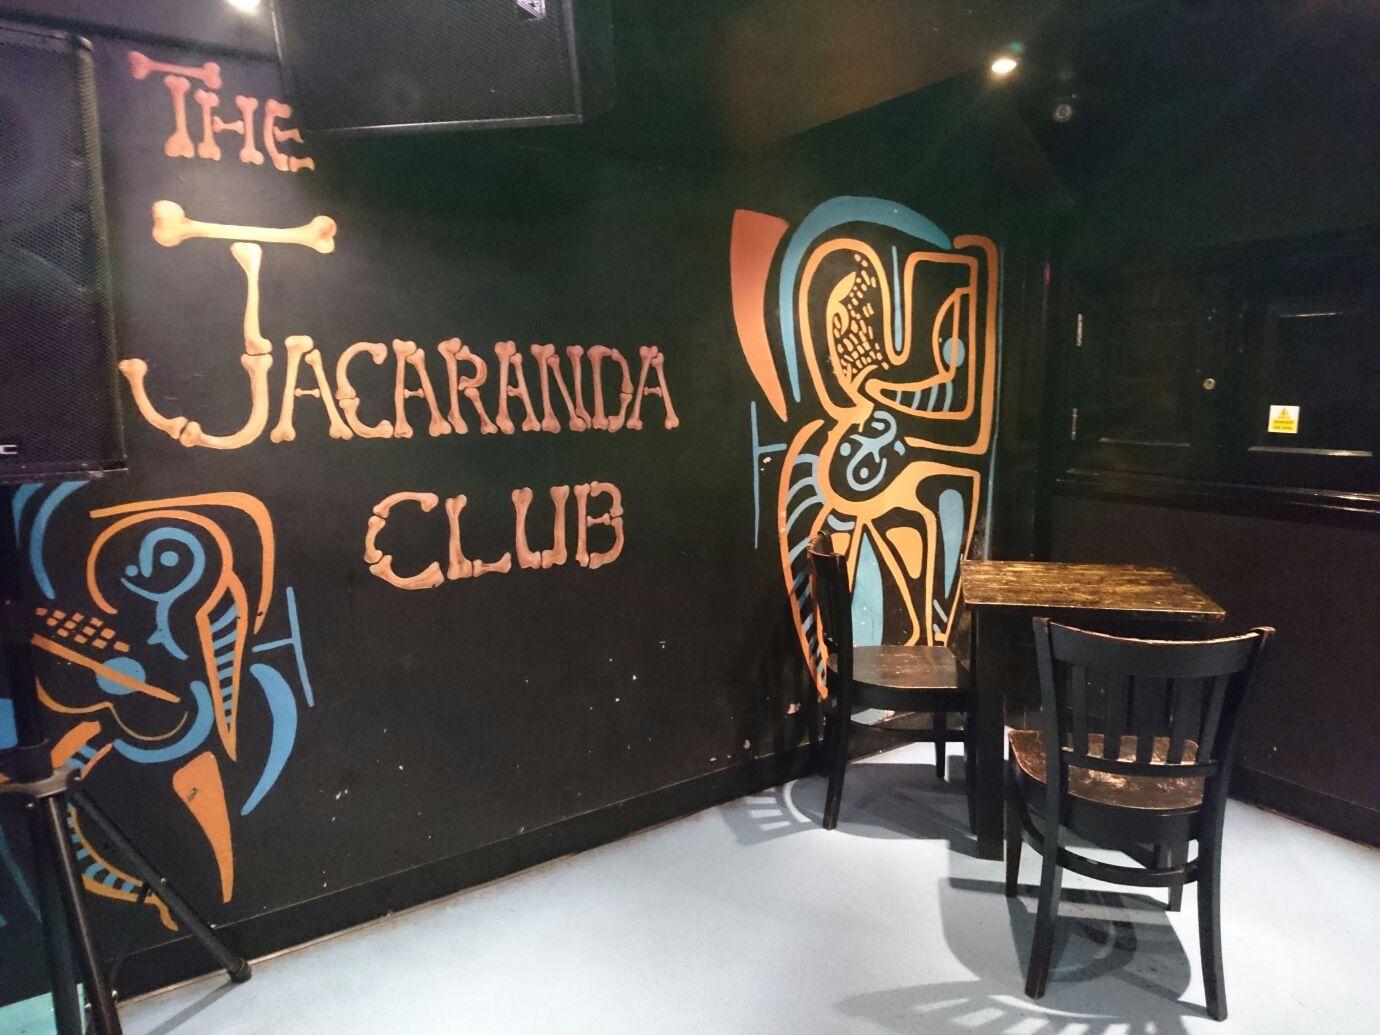 Jacaranda Club Liverpool